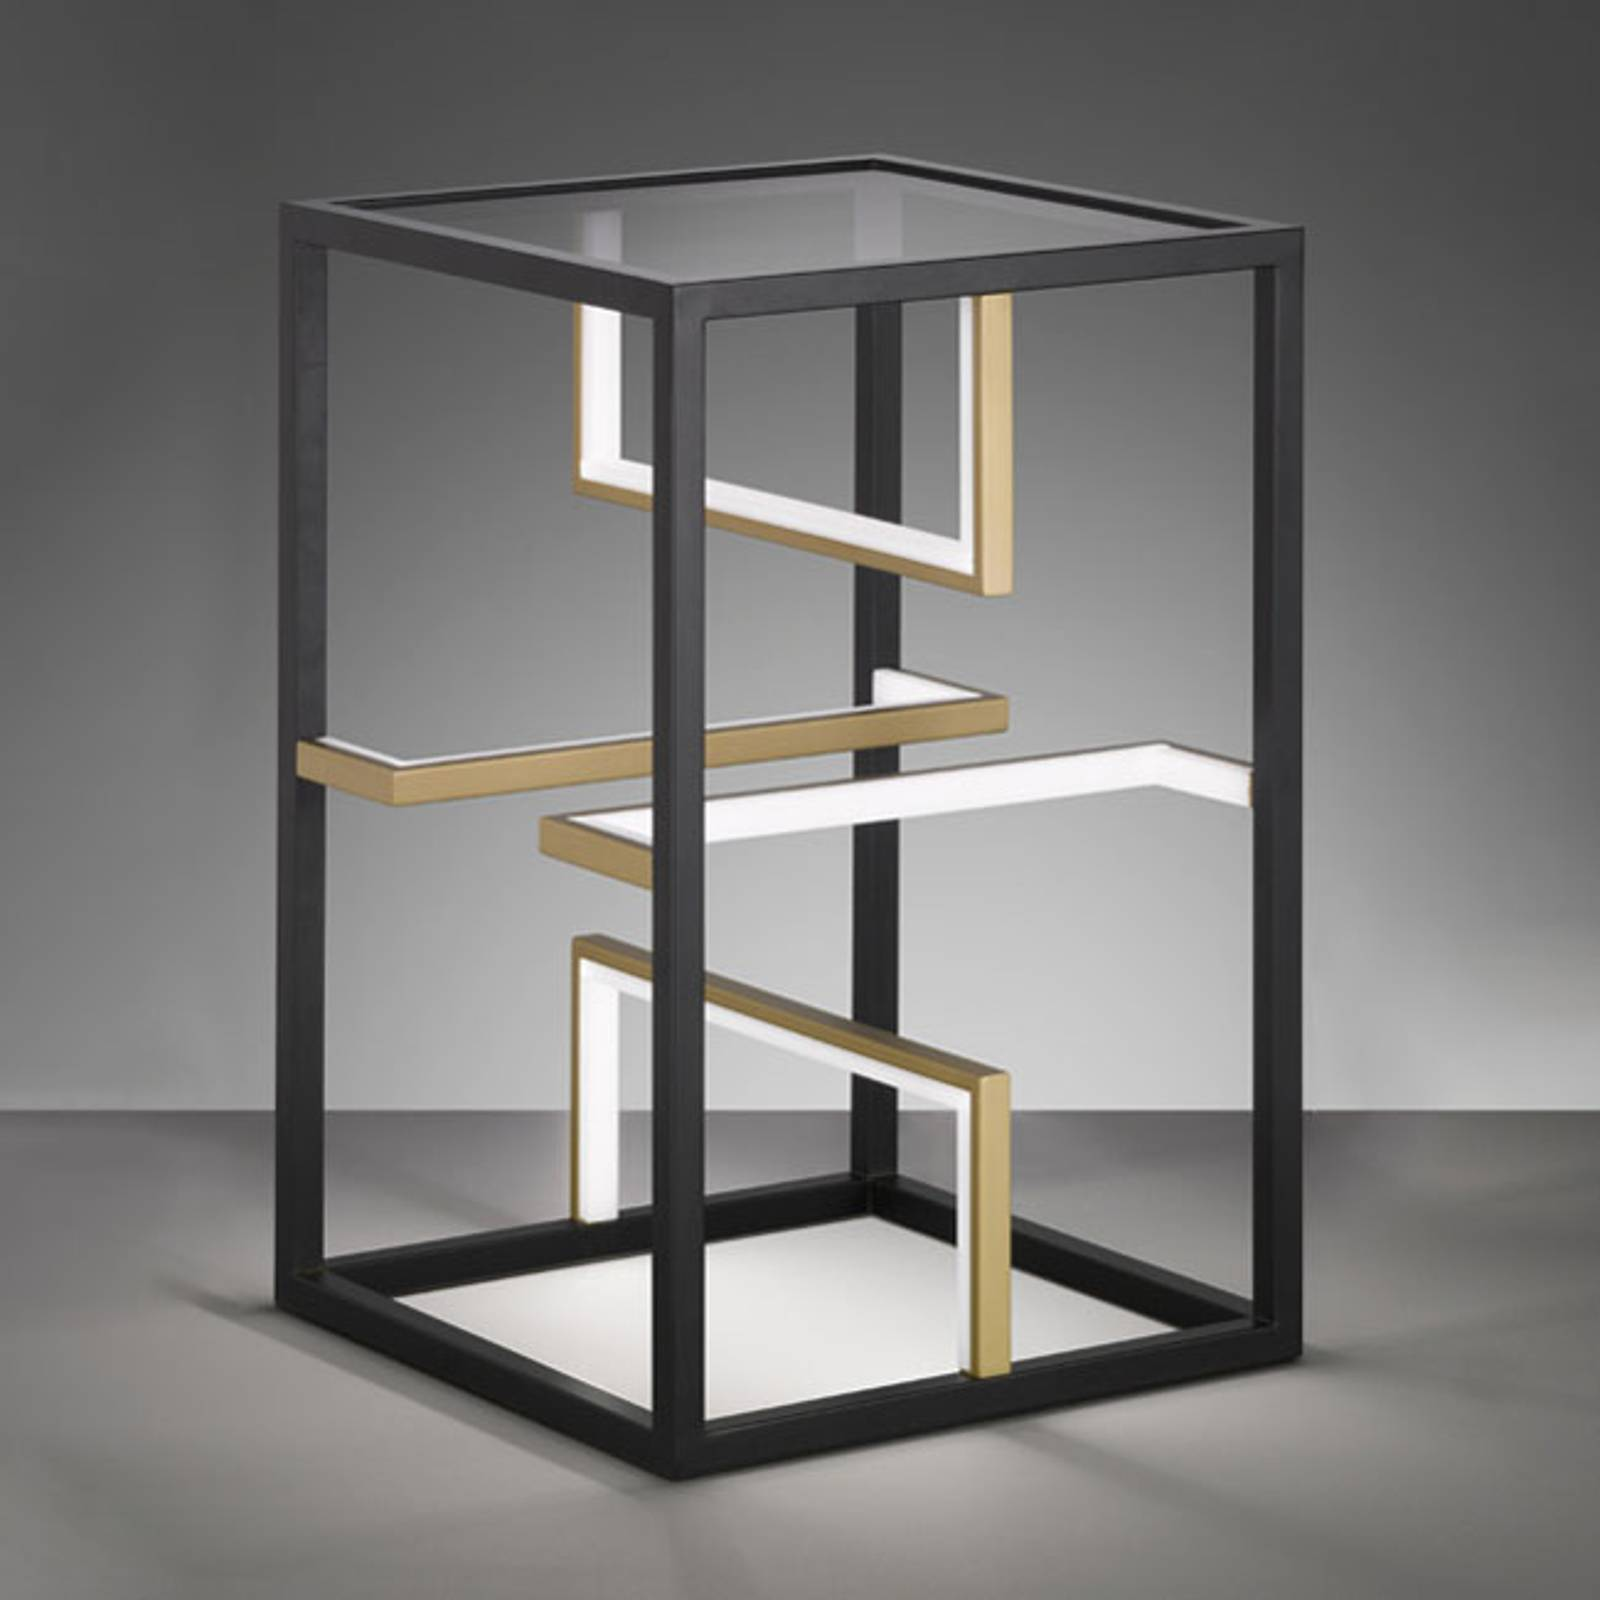 Square-LED-pöytävalaisin 40x40cm, korkeus 60 cm